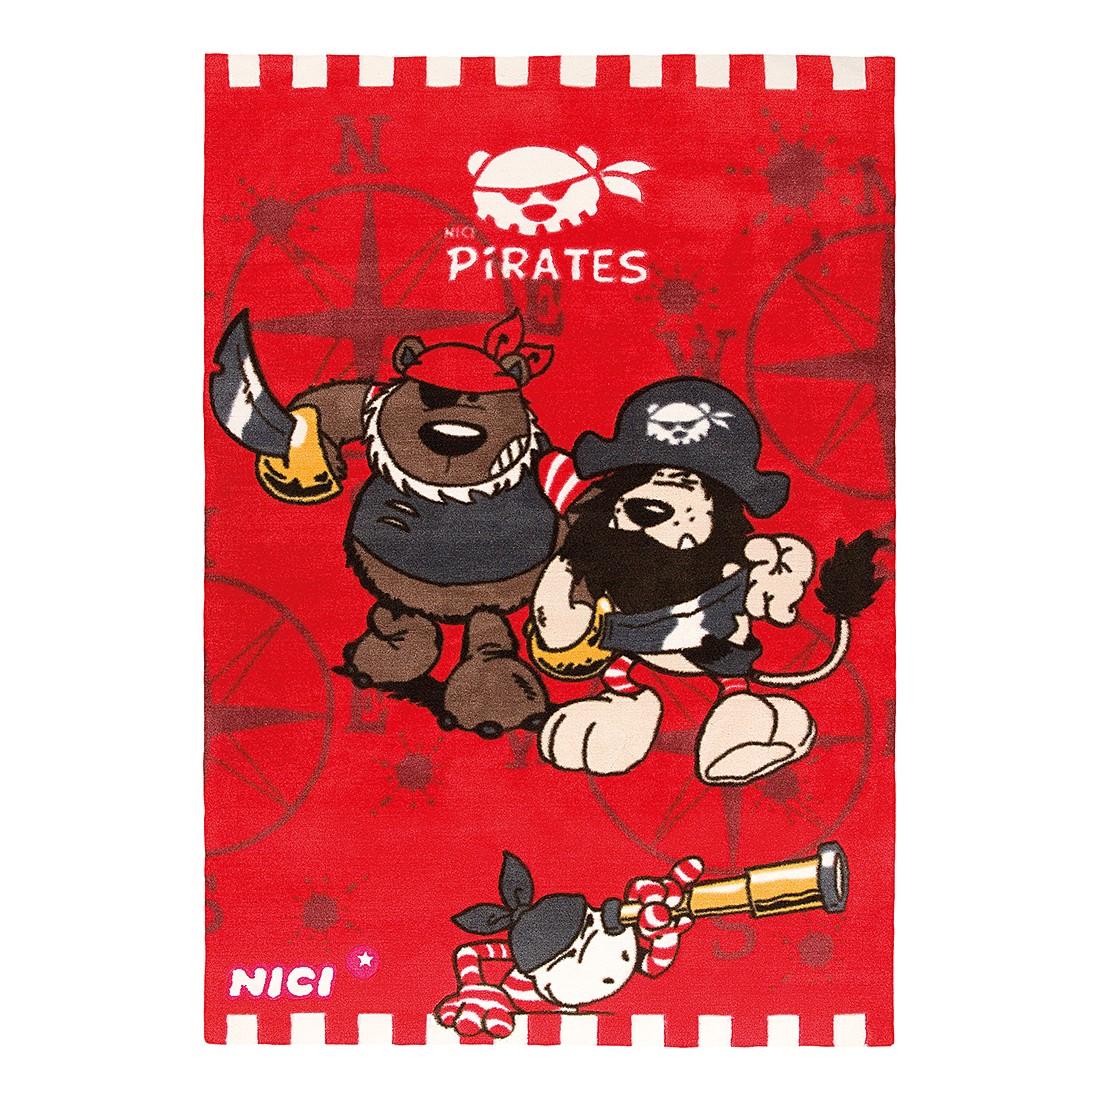 Teppich Pirates - Rot, Nici